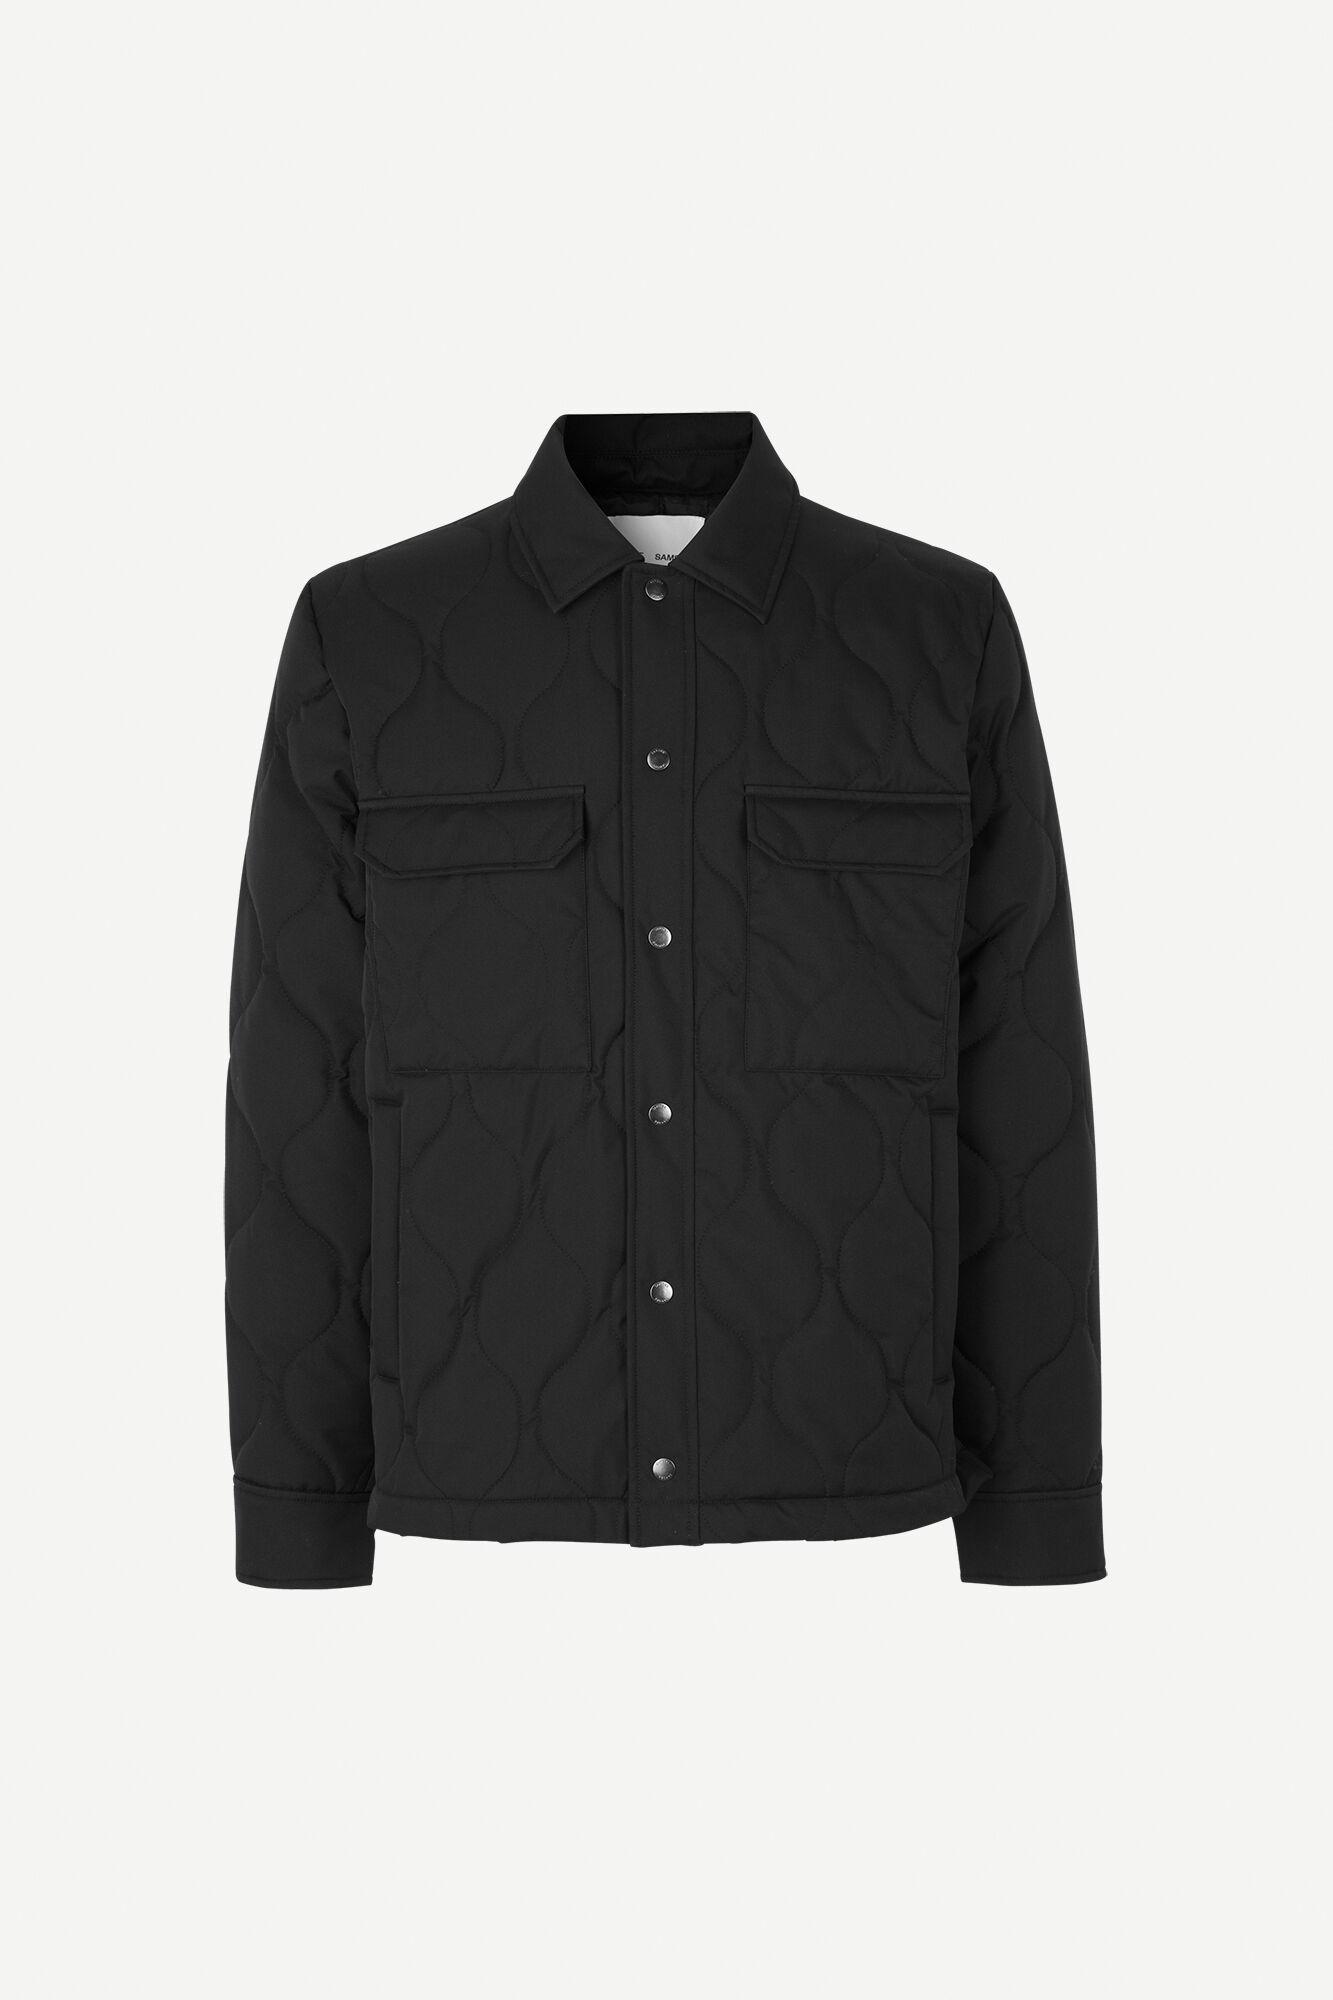 Musca jacket 12982